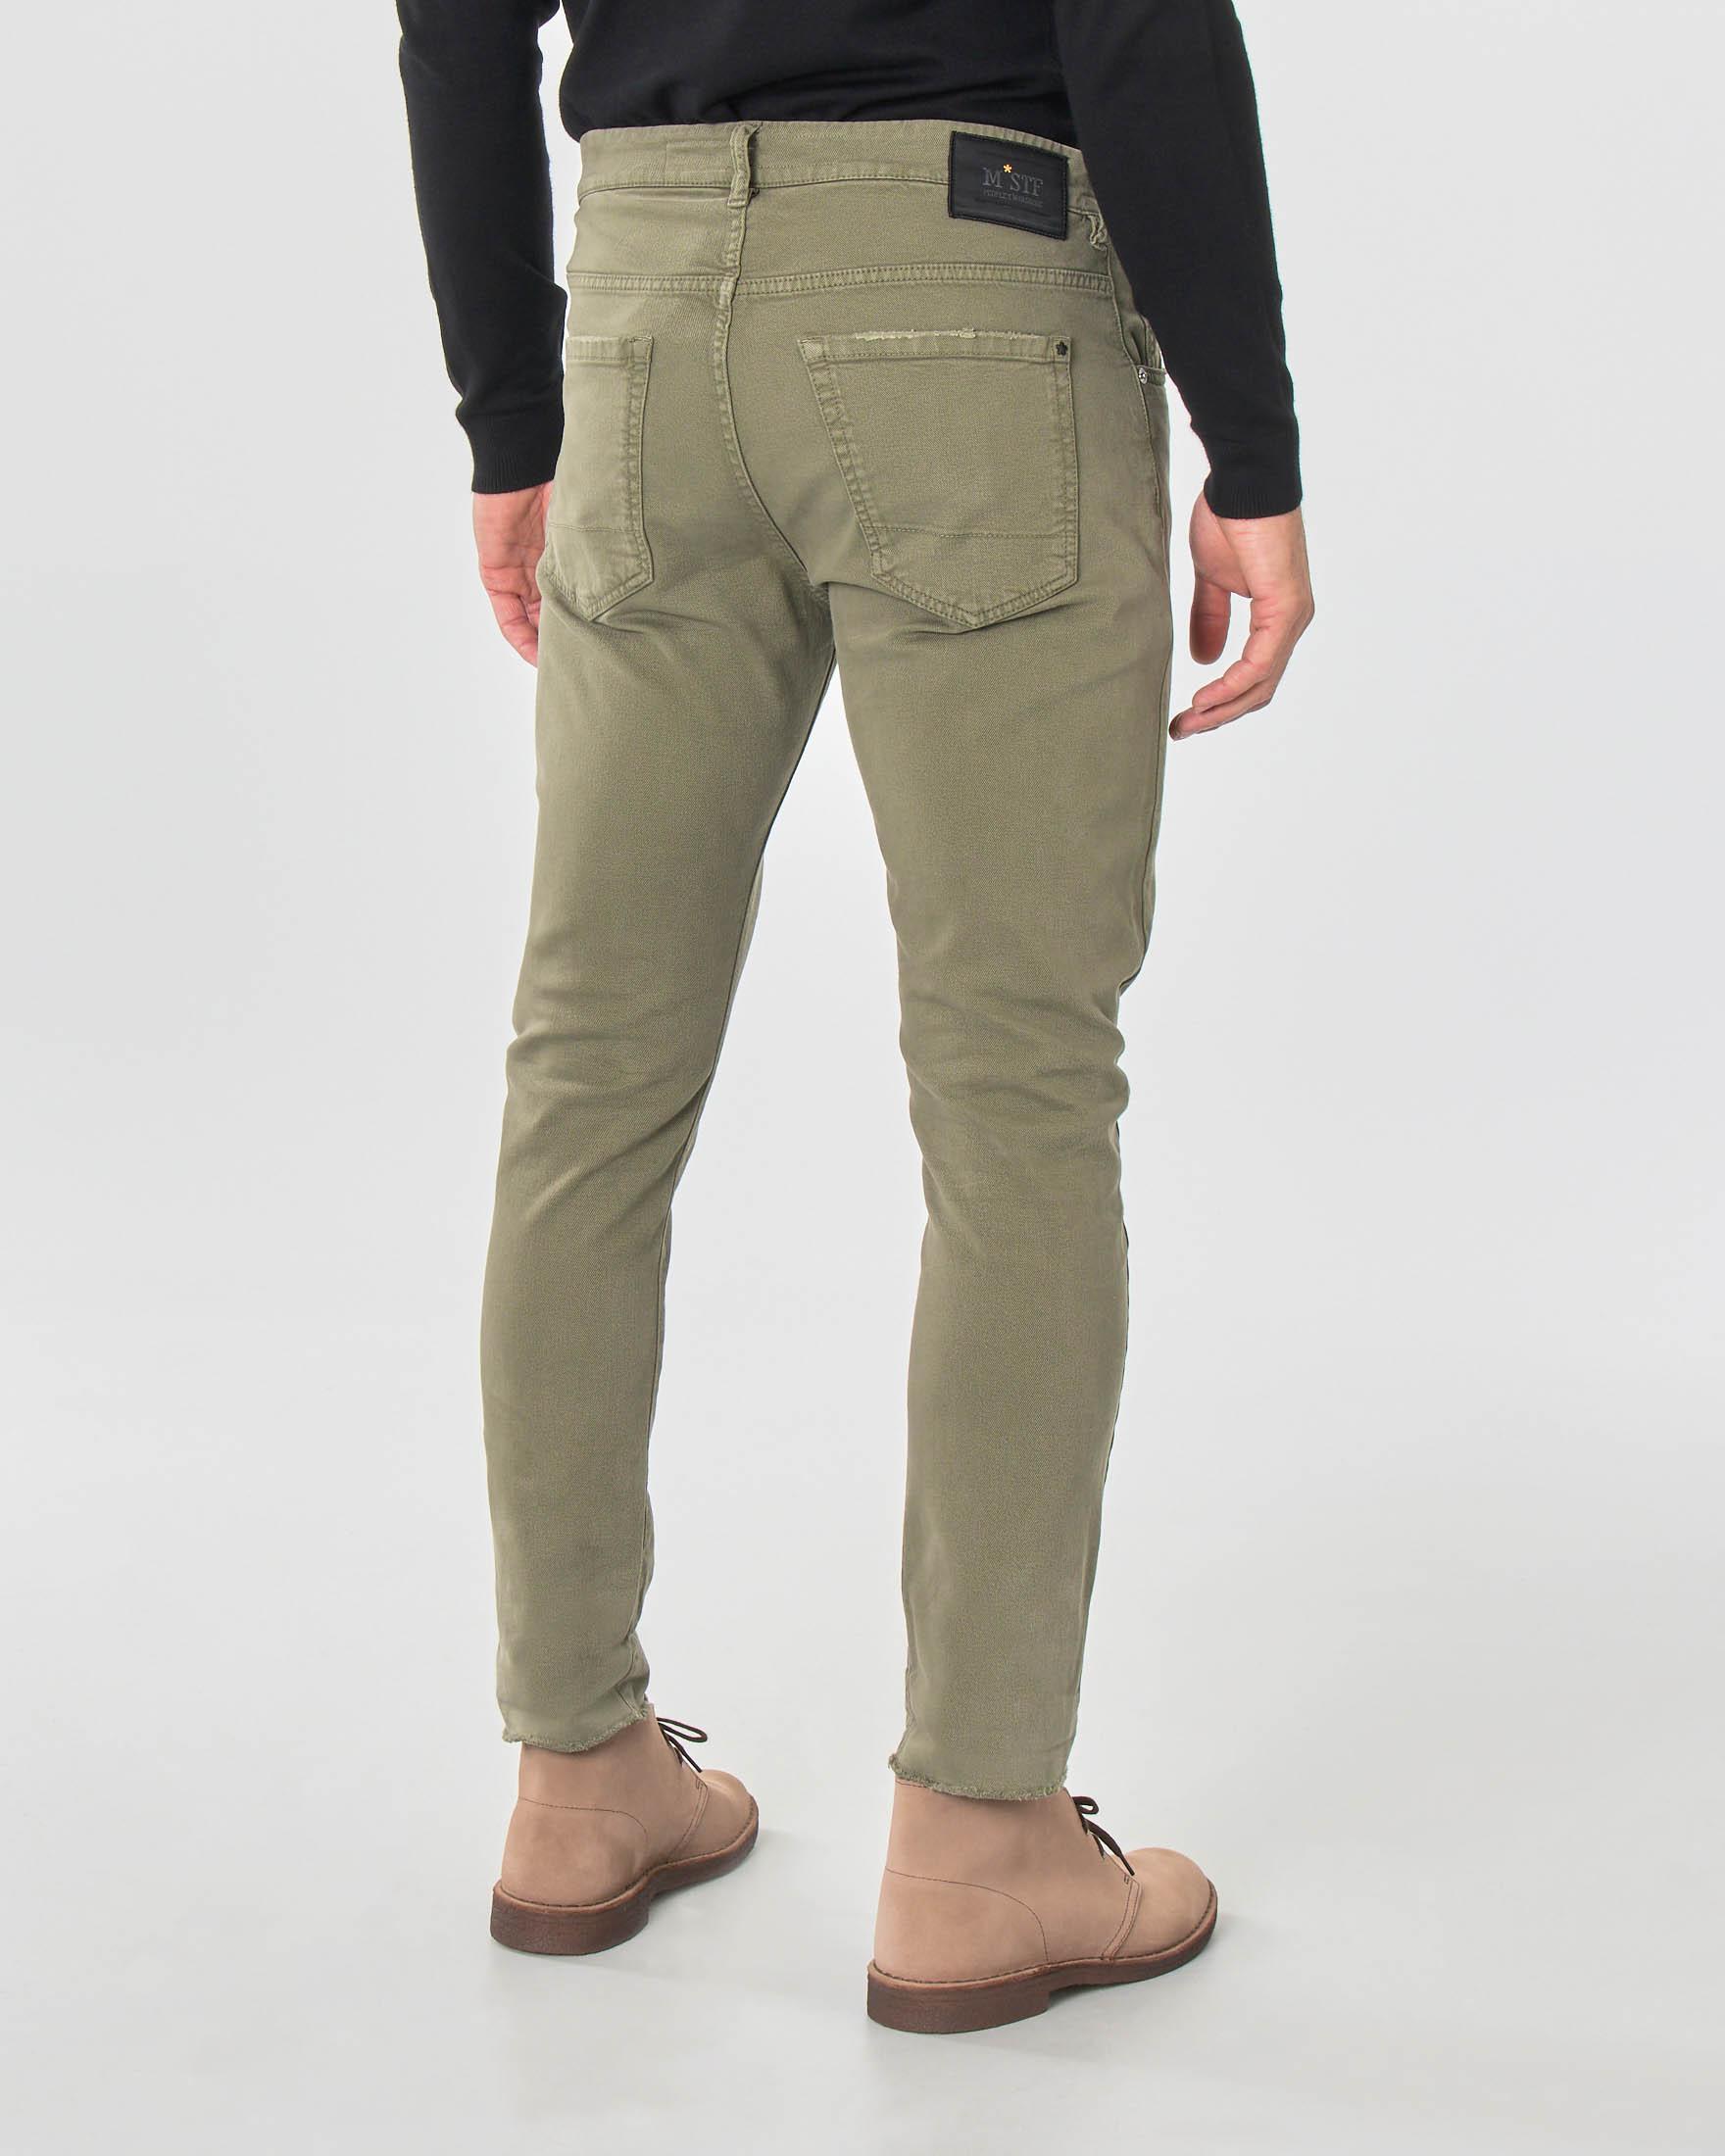 Pantalone cinque tasche verde militare in bull di cotone stretch